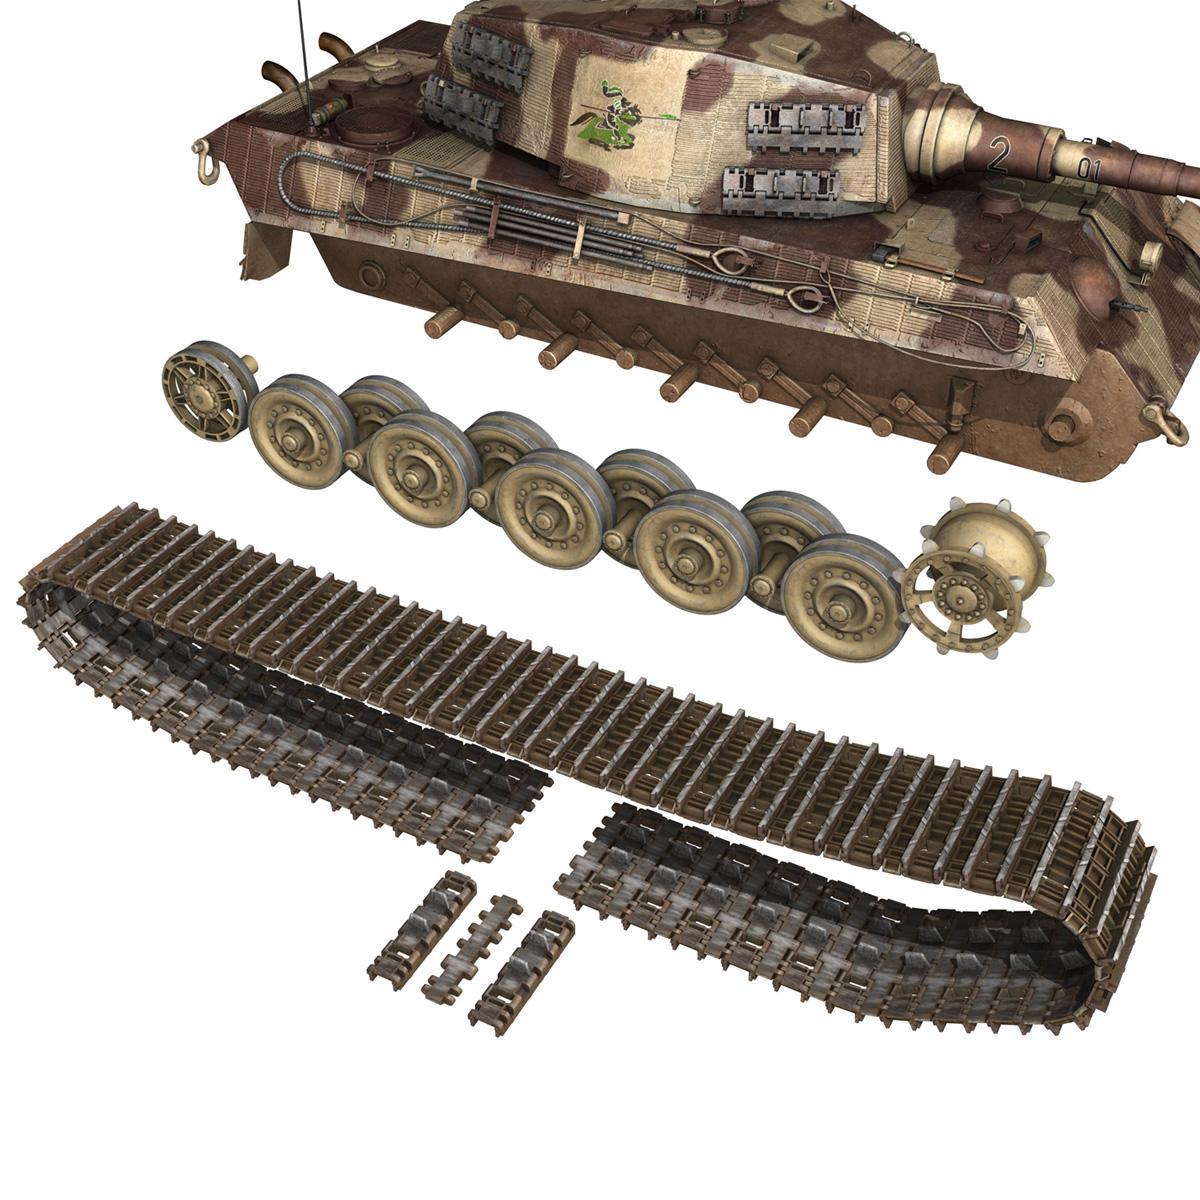 panzerkampfwagen vi – ausf b – tiger ii – 201 3d model 3ds c4d lwo lw lws obj 293311